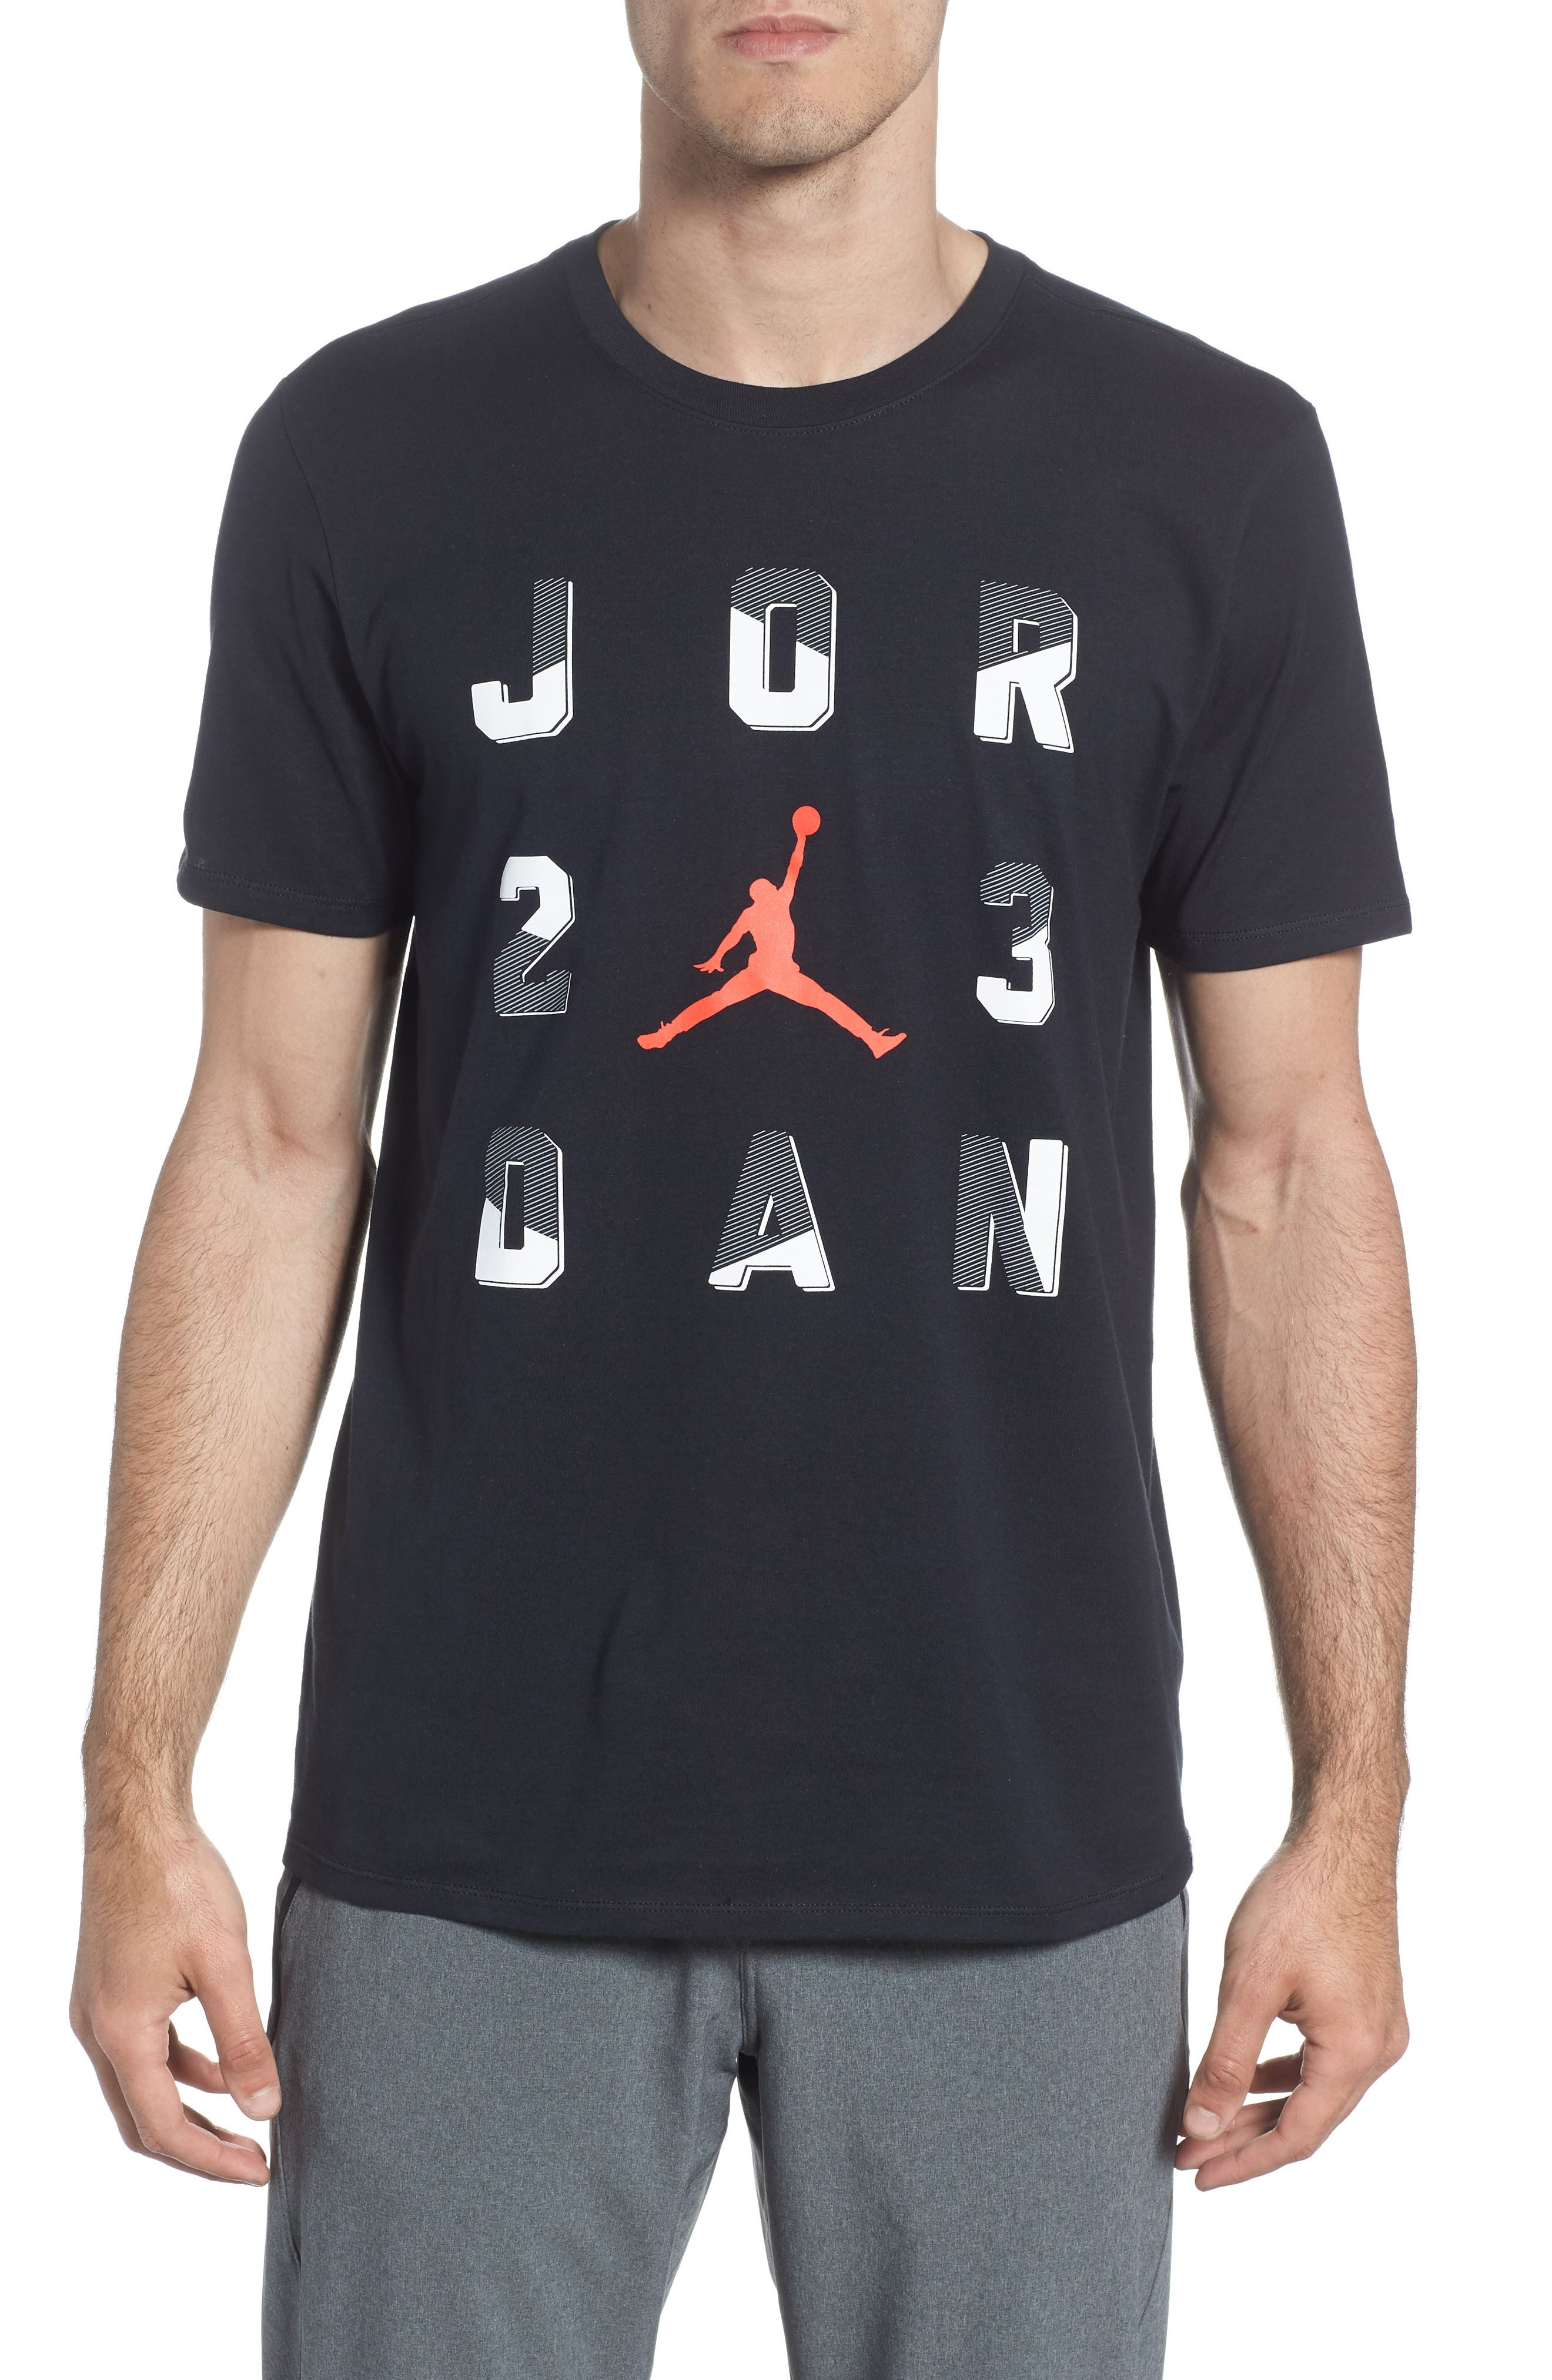 Jordan Sportswear 23 T-Shirt, Black